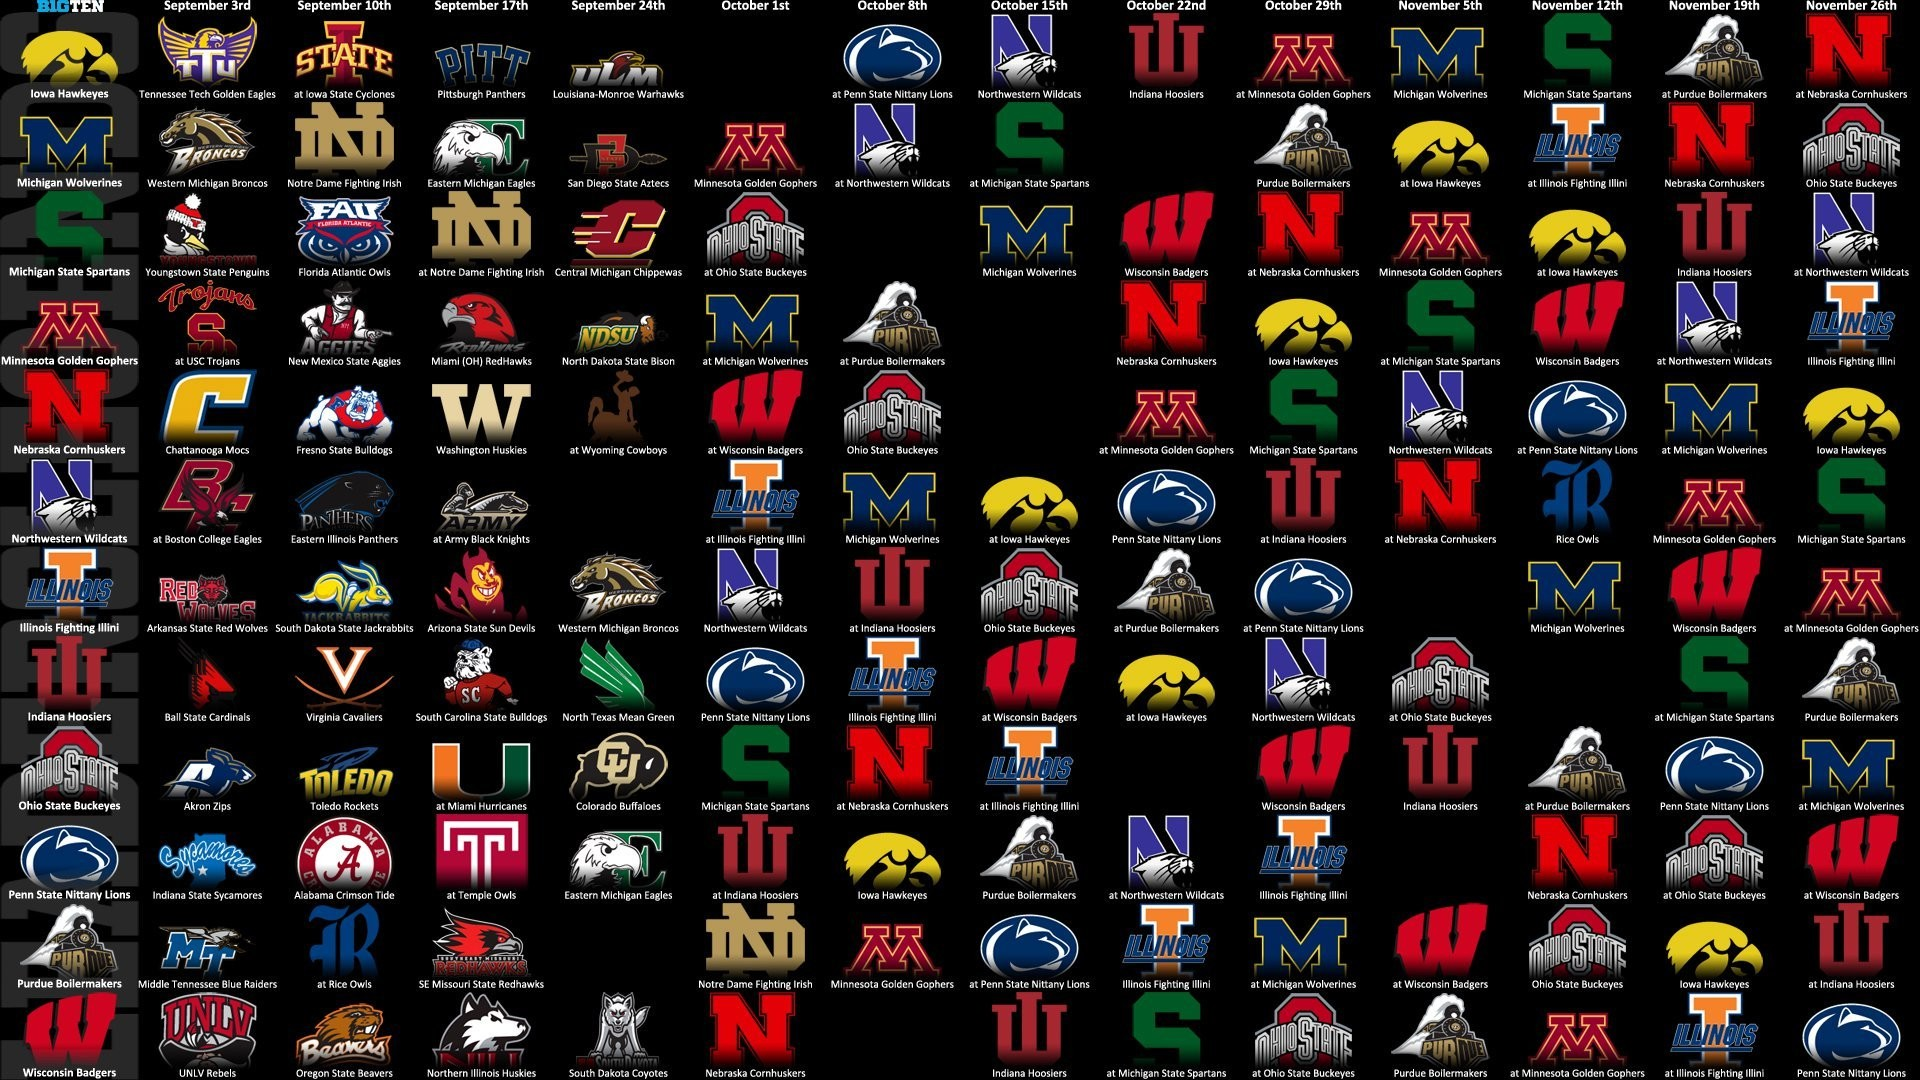 Nebraska Football Schedule 2013